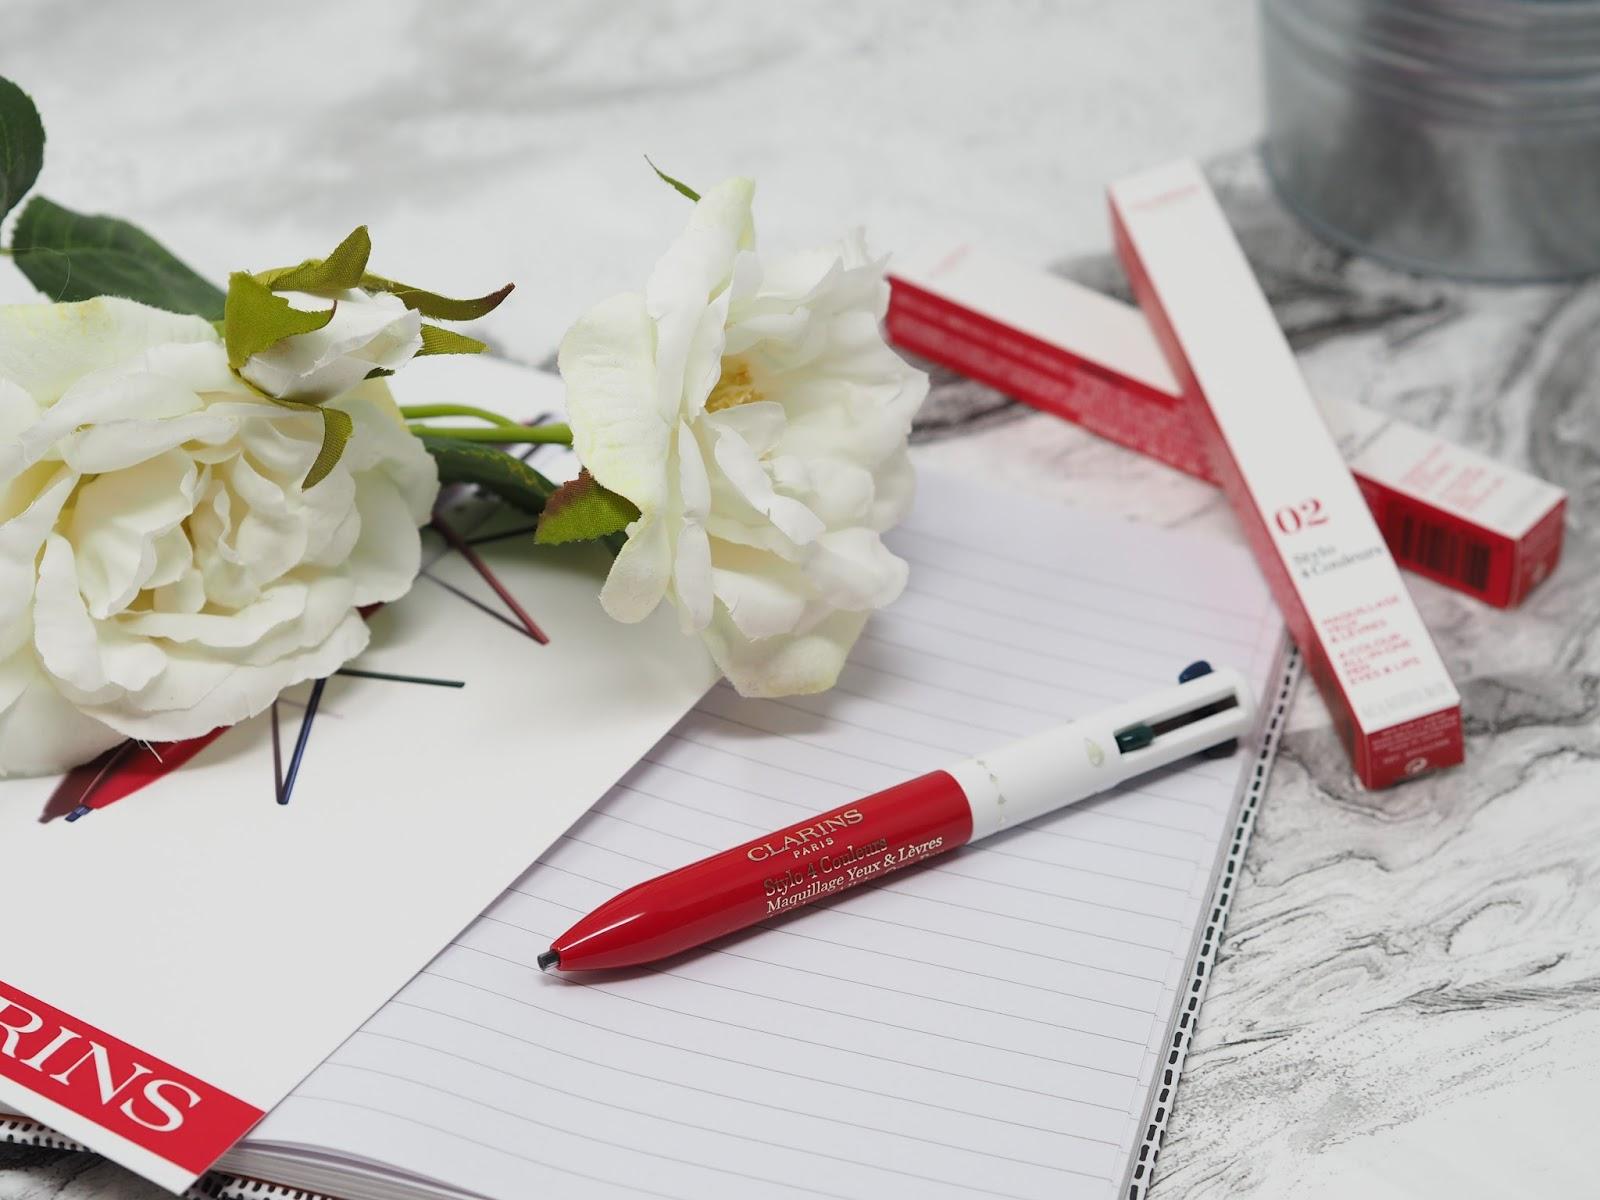 Clarins 4 Colour Pen flatlay blog review